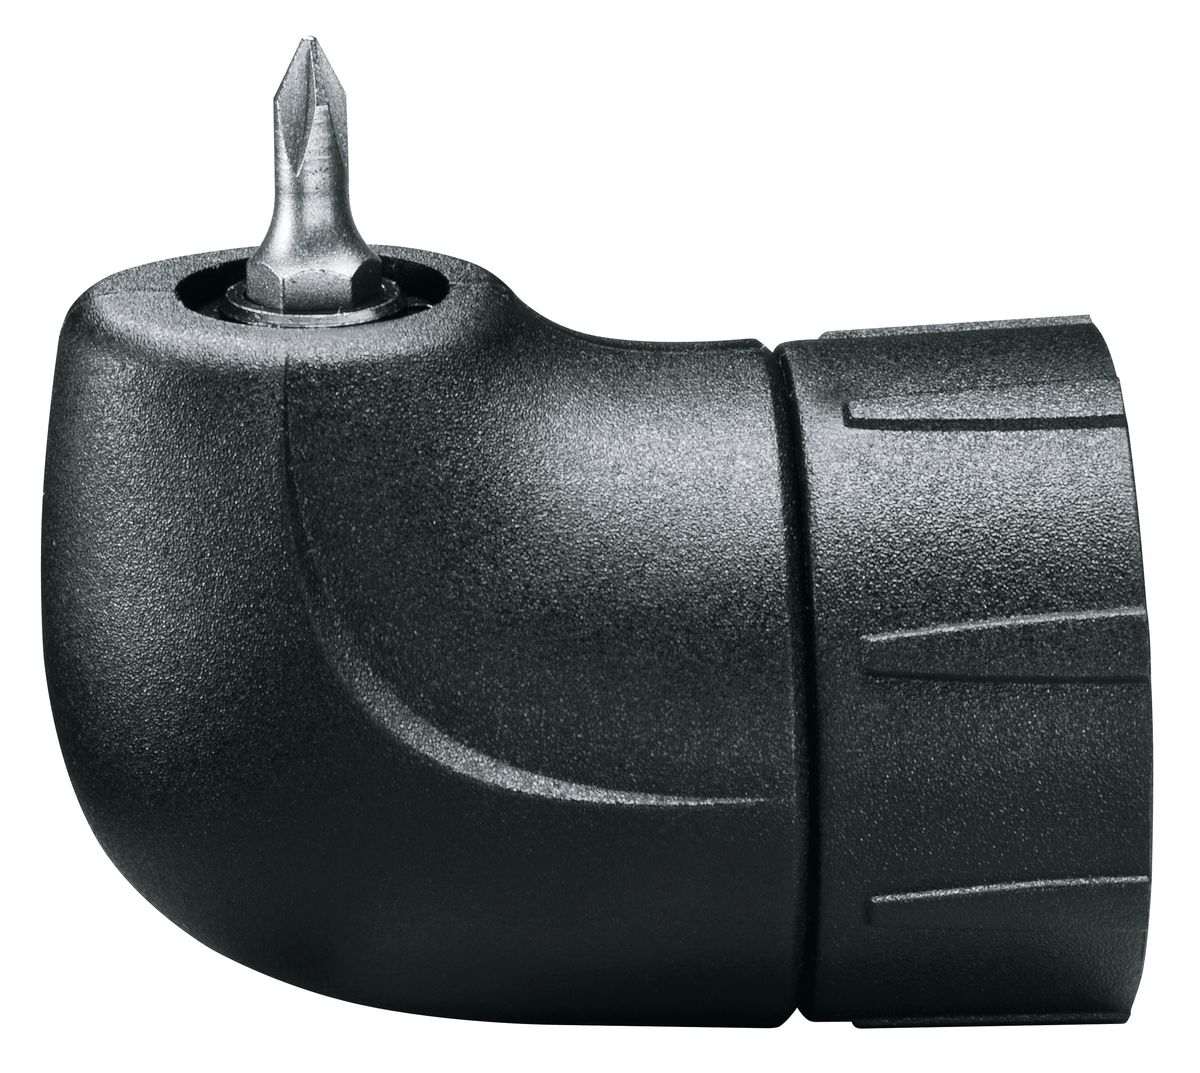 Угловая насадка для Bosch IXO V 1600A001Y8 насадка нож cutter для bosch ixo v 1600a001yf